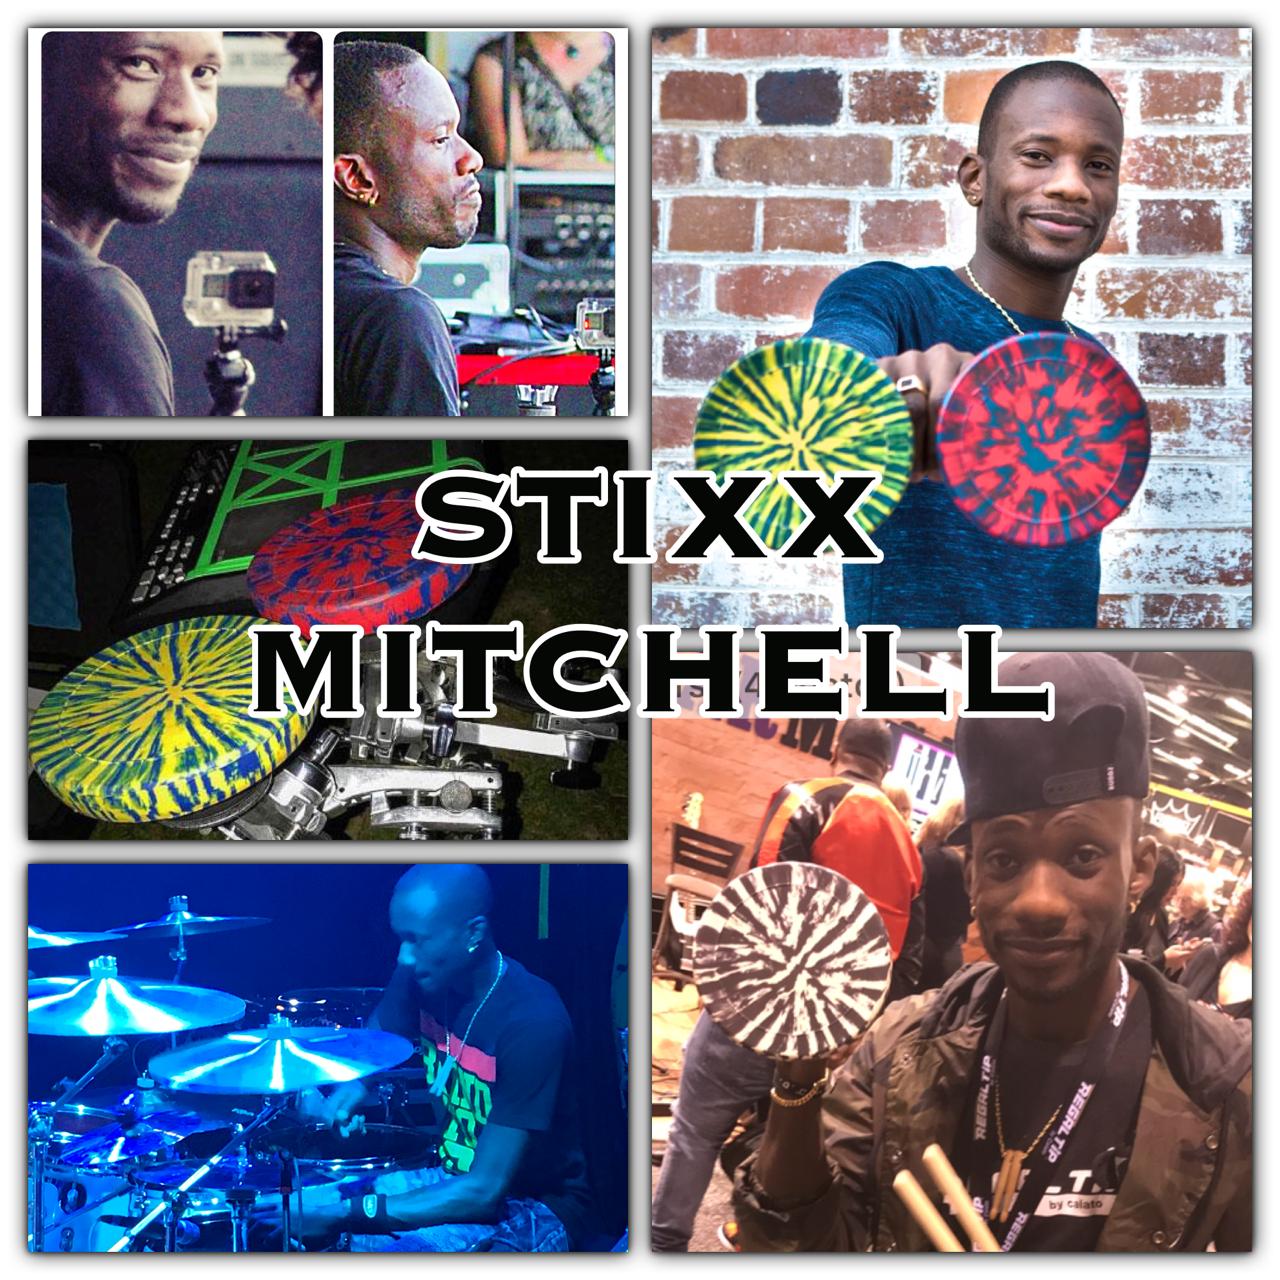 STIXX MITCHELL